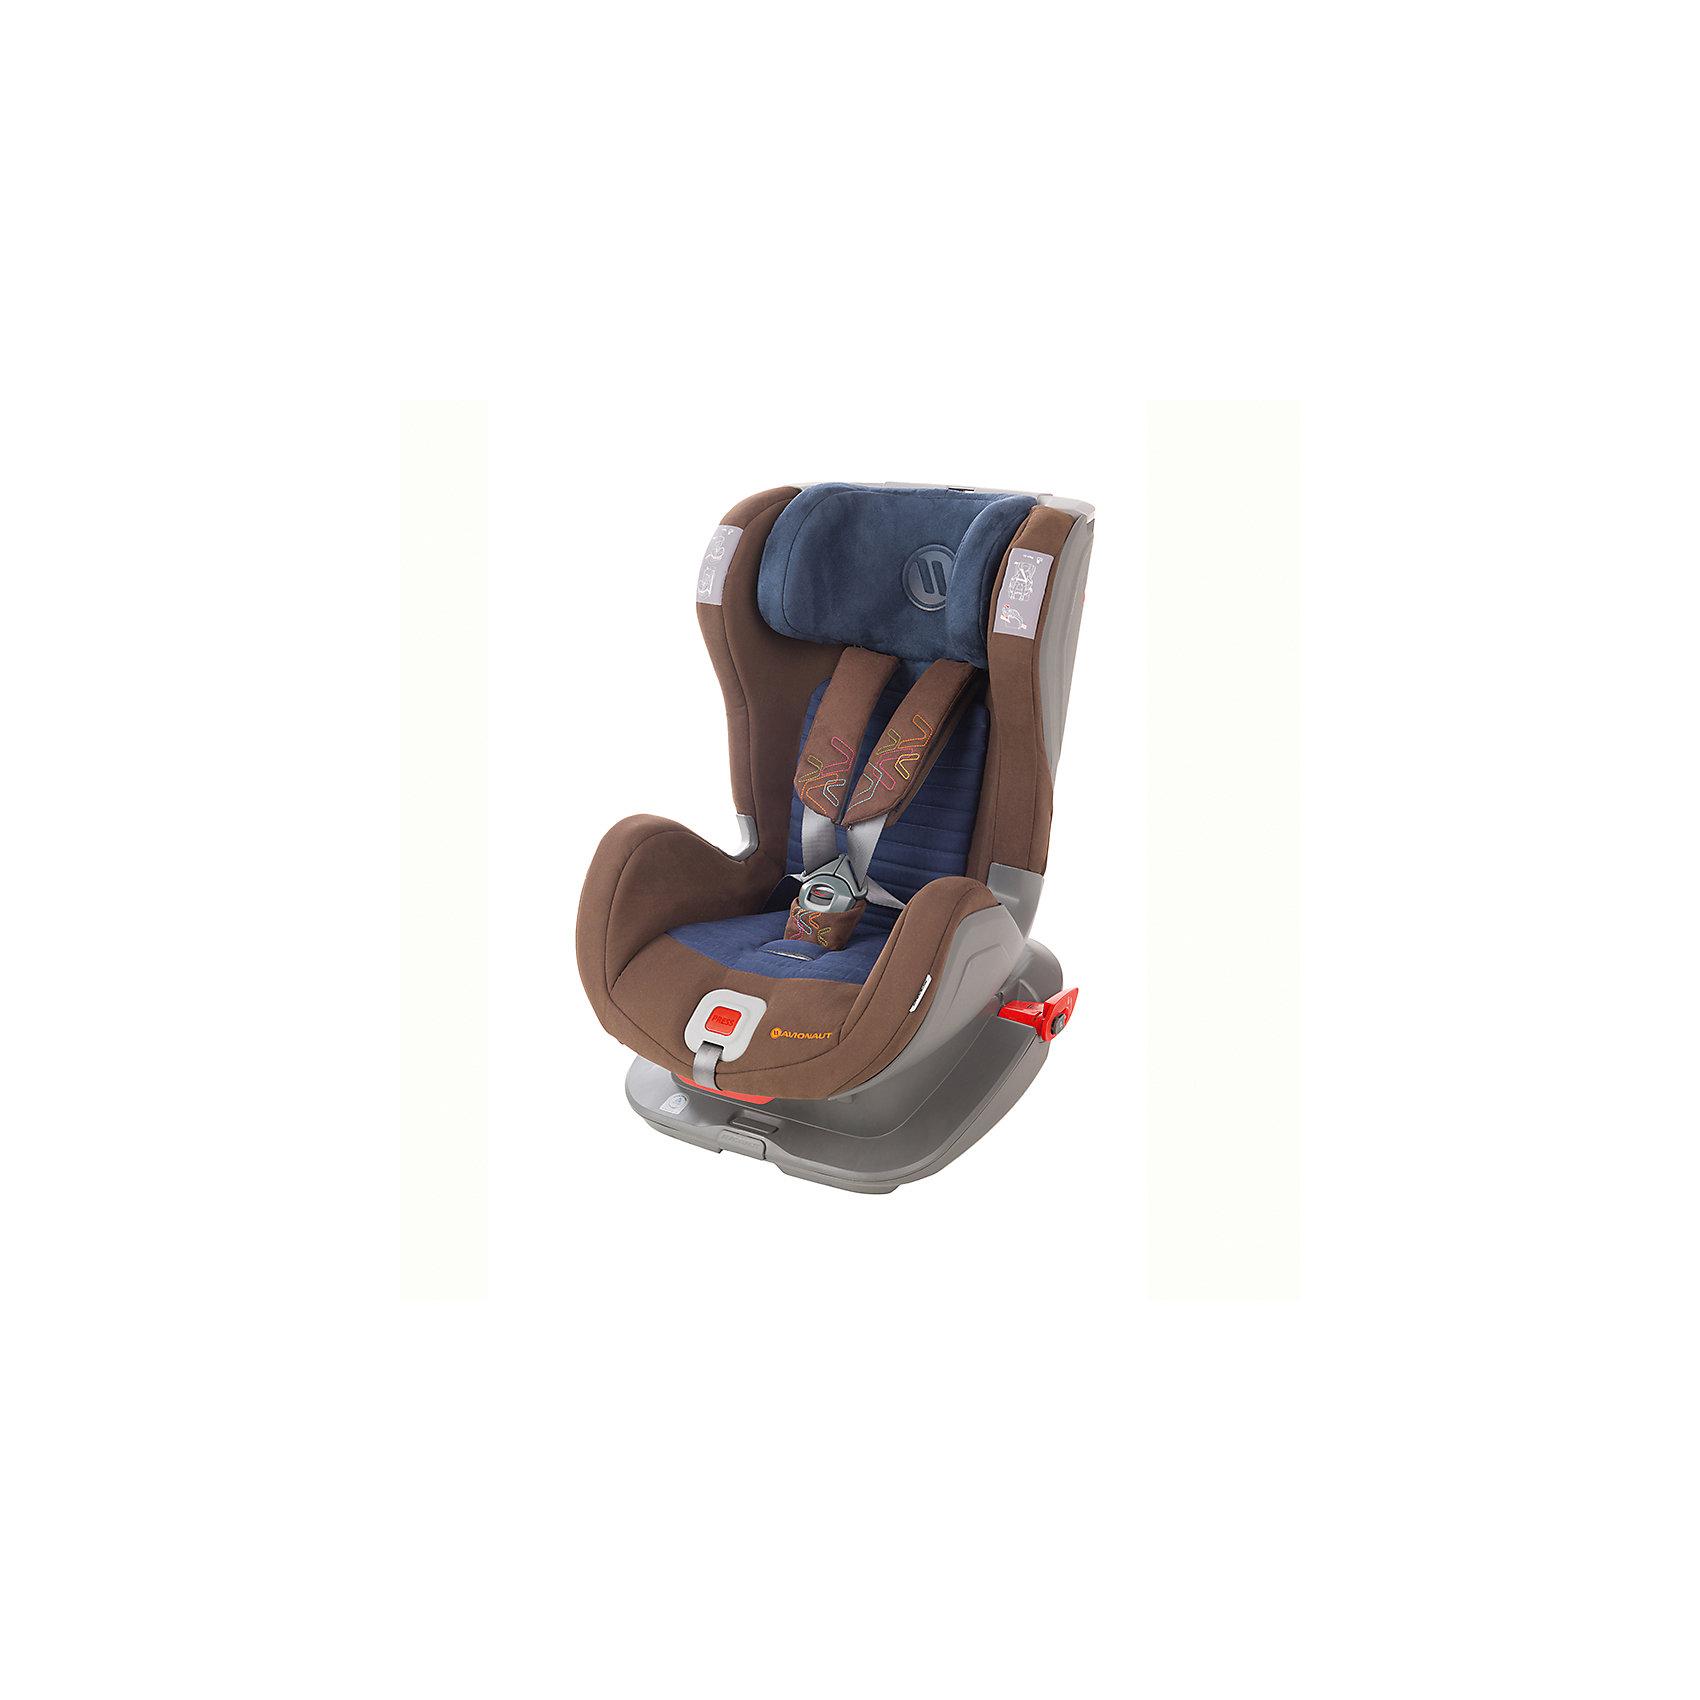 Автокресло Avionaut GLIDER SOFTY ISOFIX, 9-25 кг, коричневый/синий